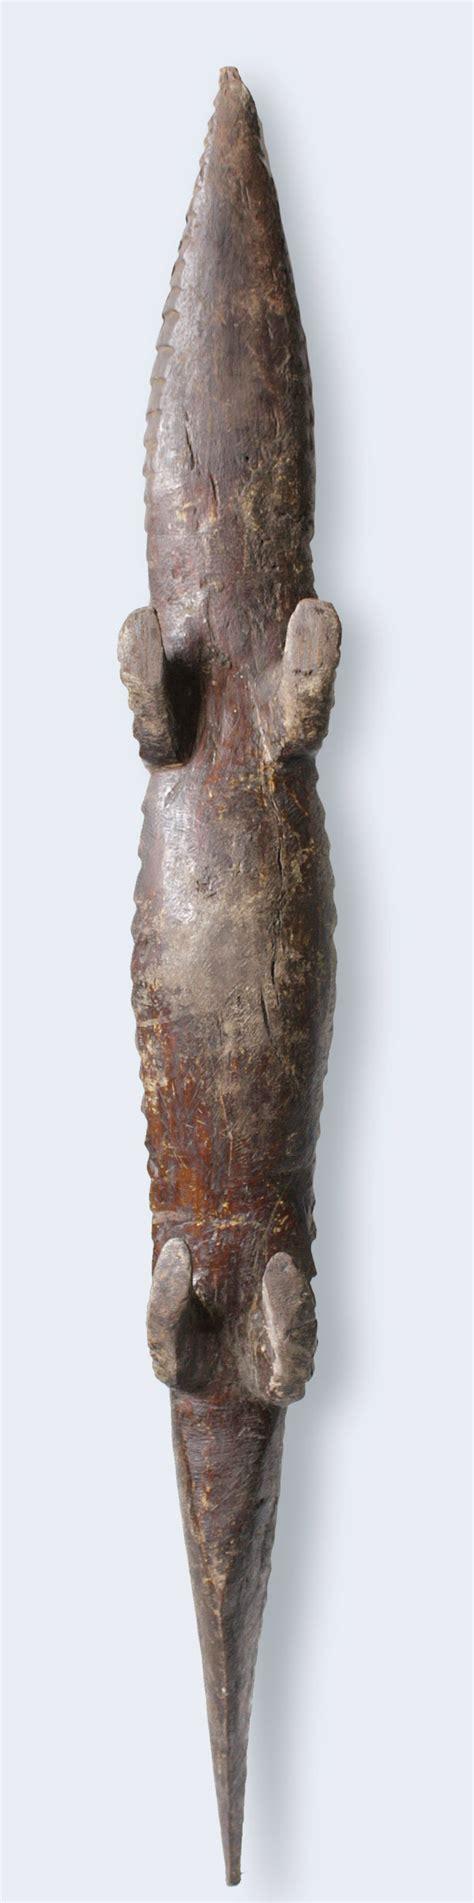 Suku Suku Animal suku krokodil ritual alligator crocodile animal figure